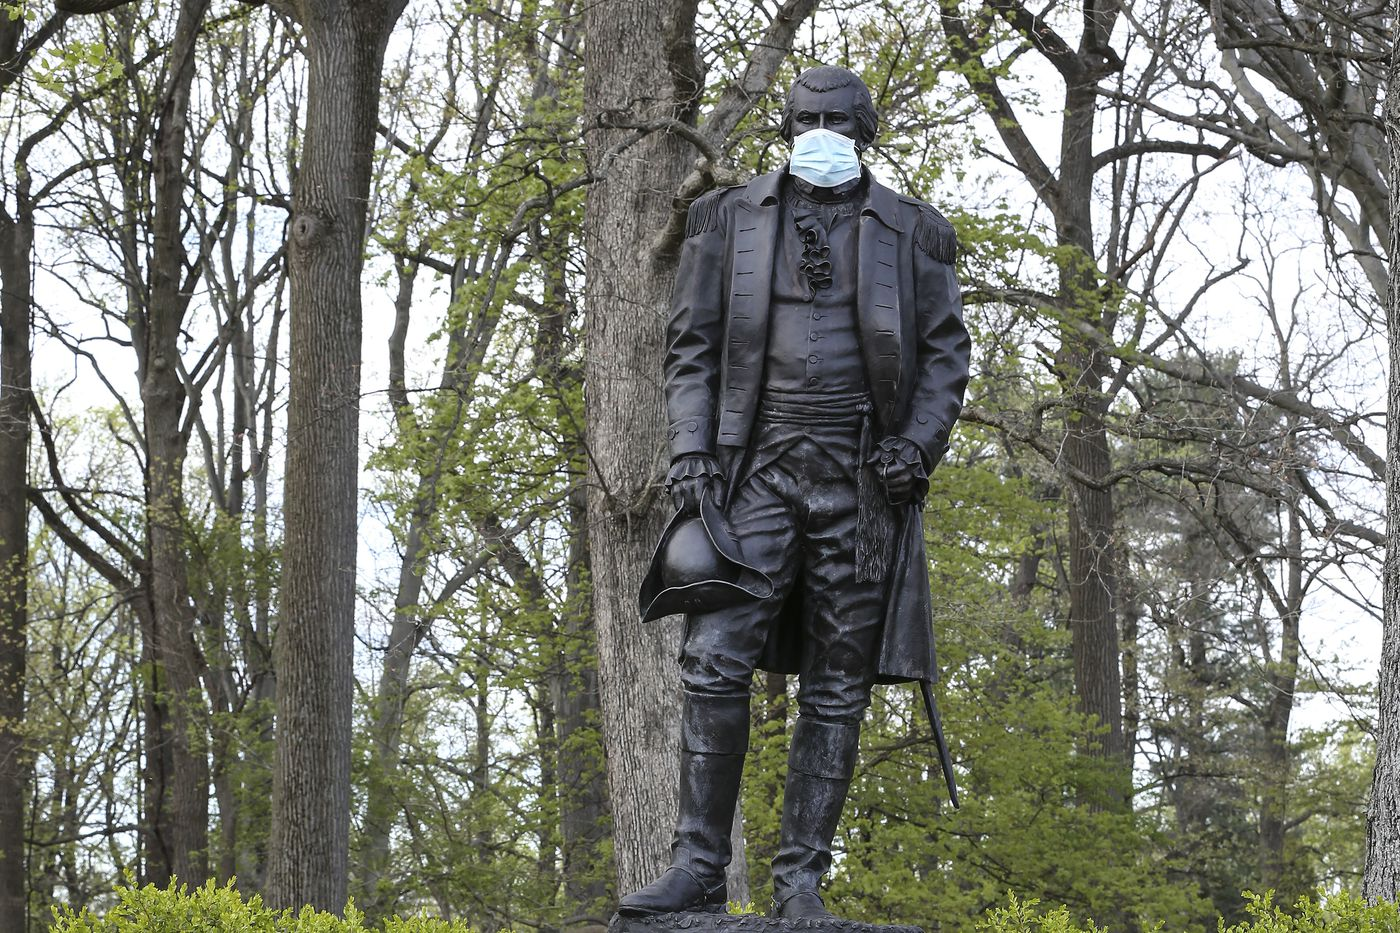 Pennsylvania plans 'small steps' toward economic reopening; Murphy says N.J. needs federal help, more coronavirus testing capacity